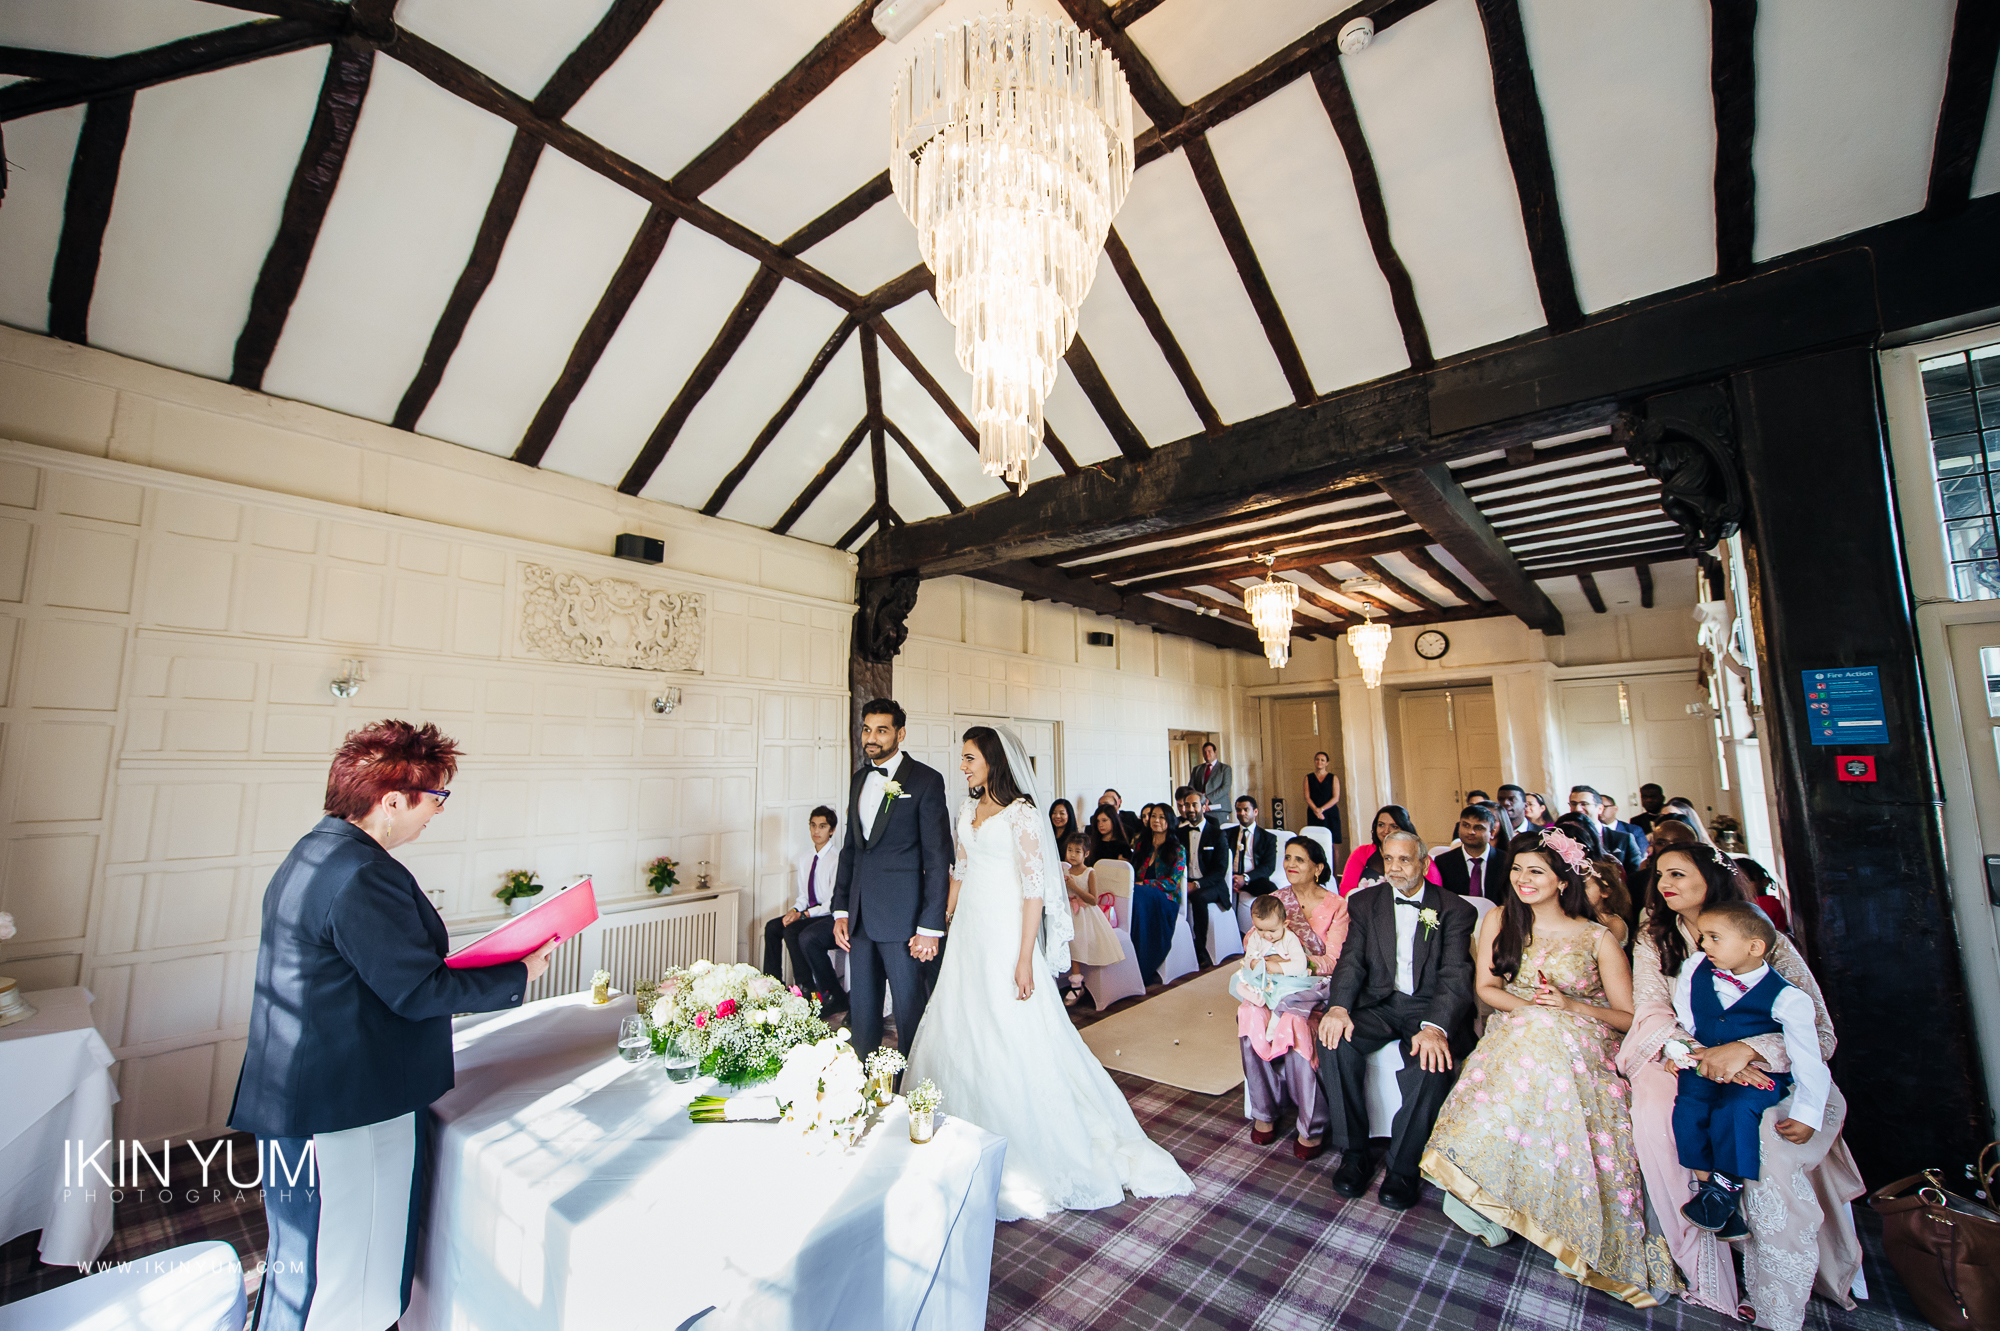 Laura Ashley Manor Wedding - Ikin Yum Photography-046.jpg